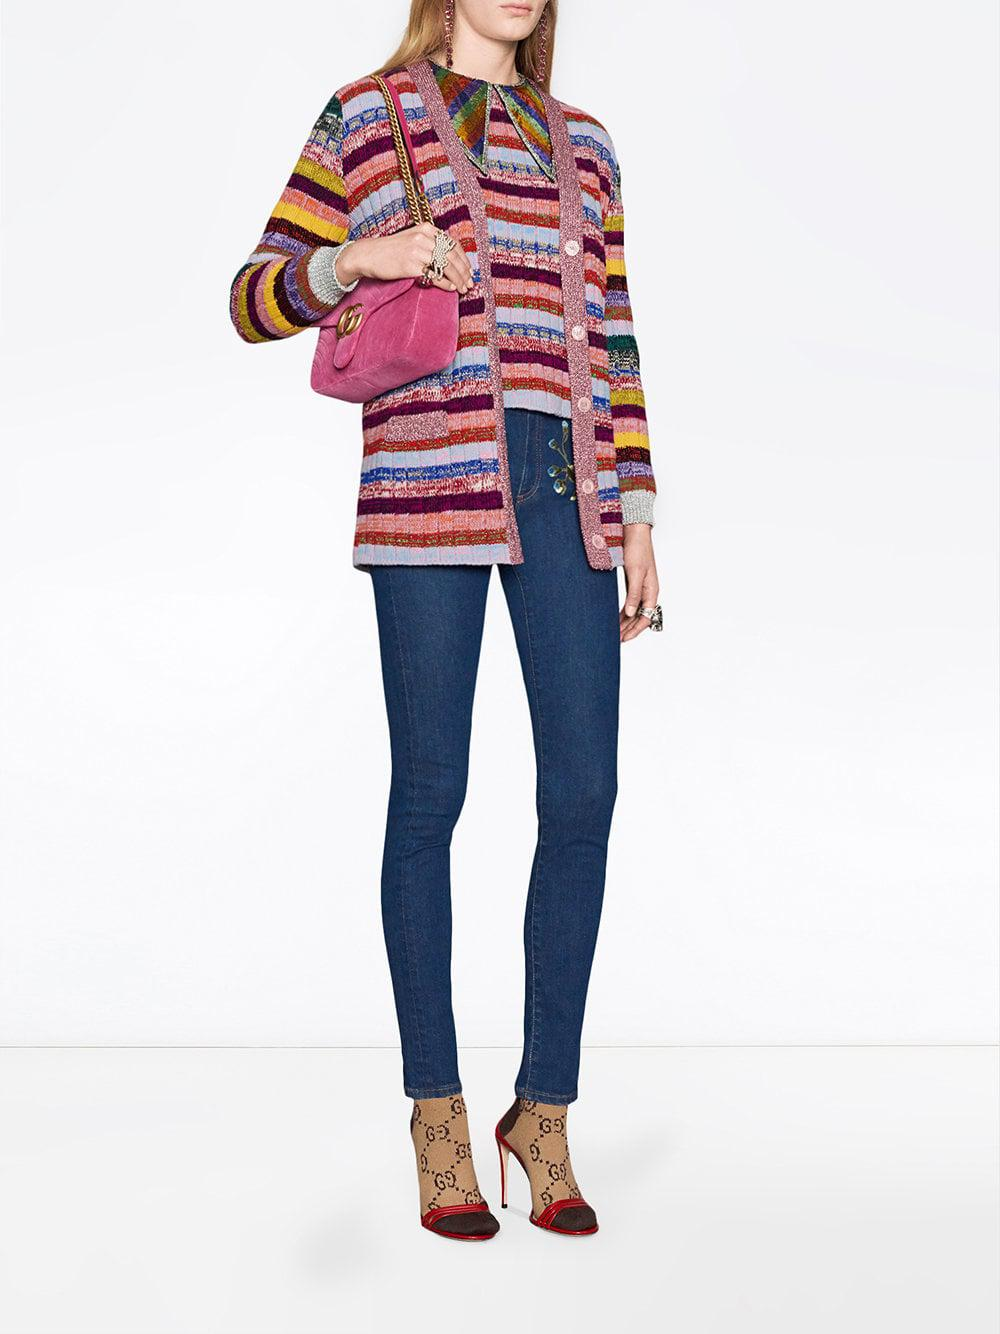 661096cf959 Gucci GG Marmont Chevron Velvet Shoulder Bag in Pink - Save 21% - Lyst